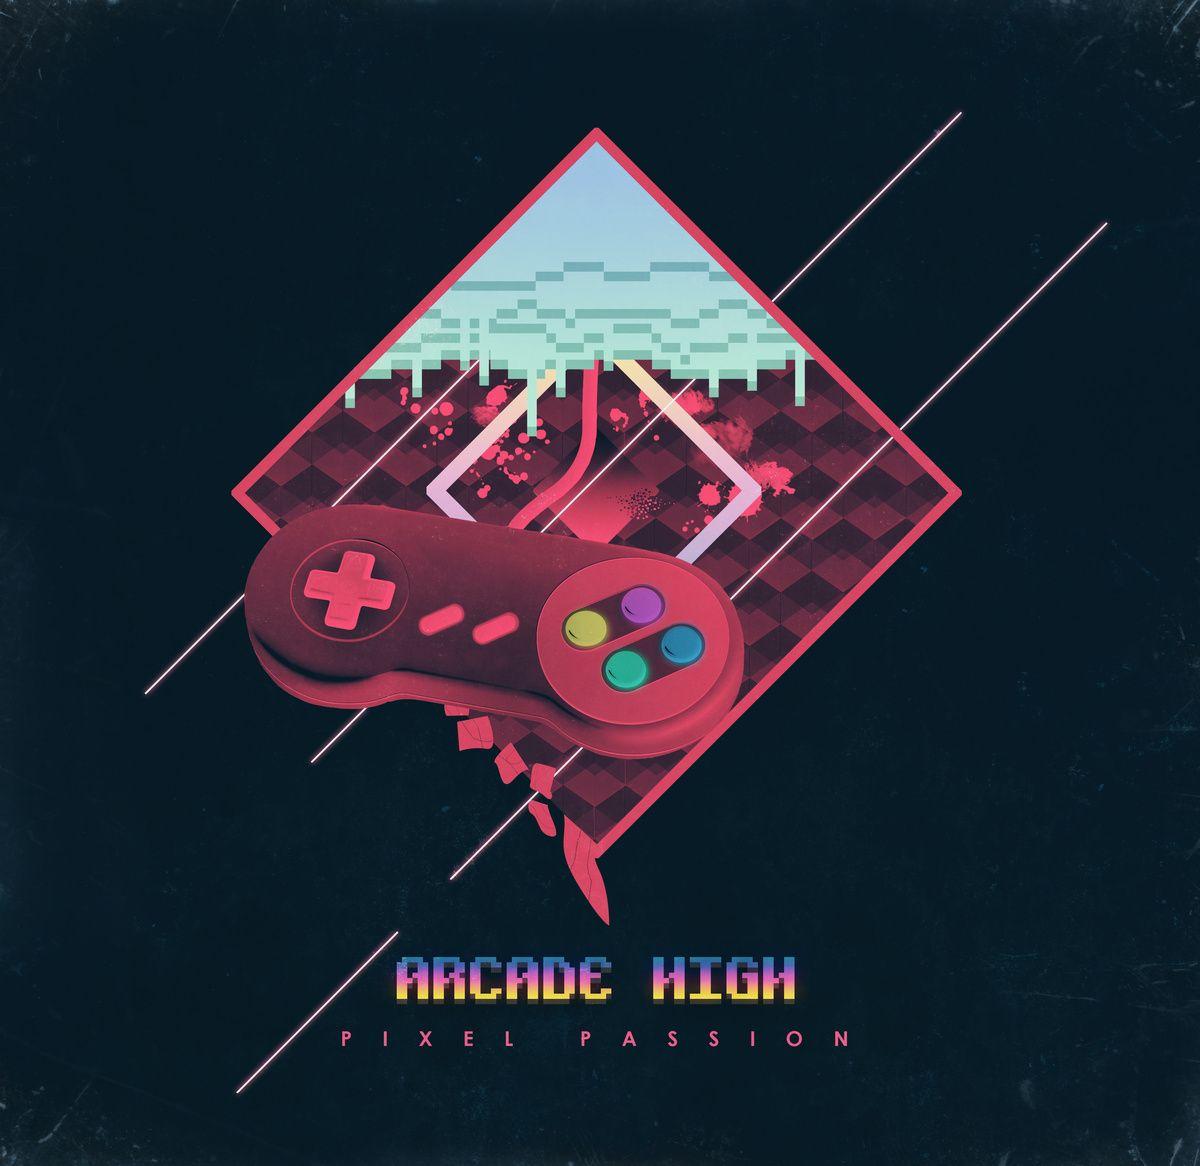 Pixel Passion By Arcade High Rock Album Covers Pixel Neon Art